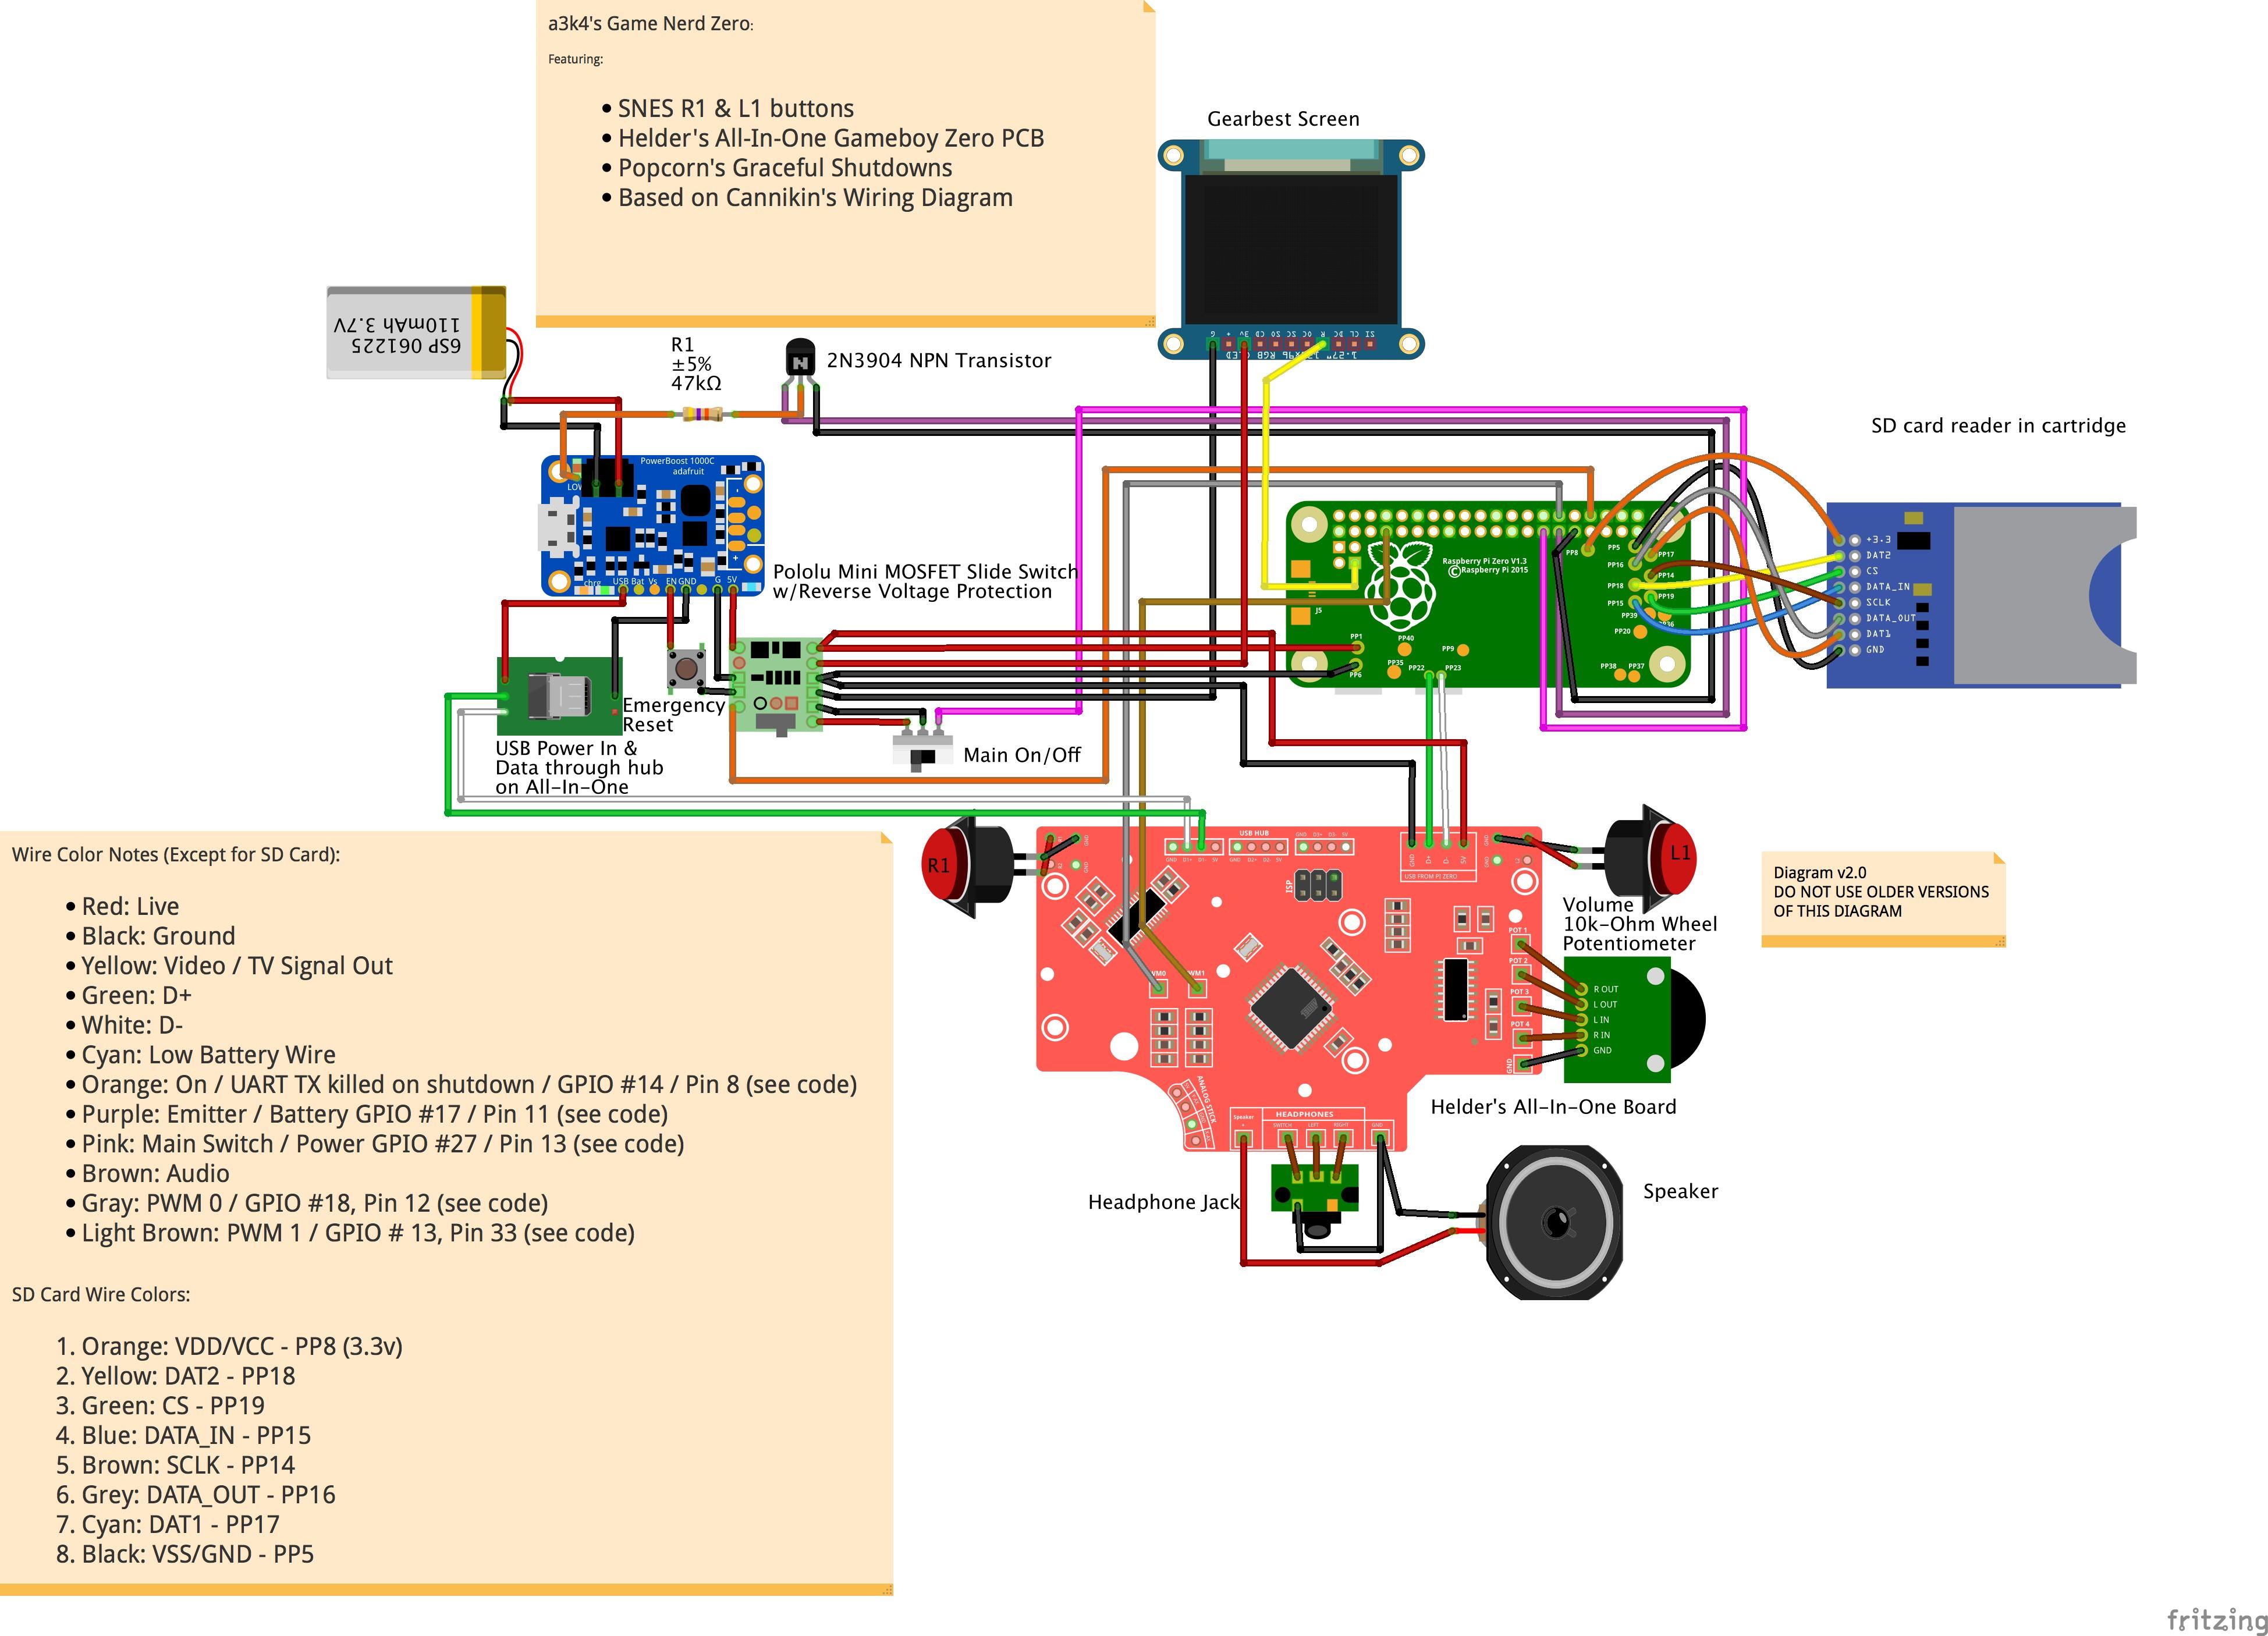 Gameboy Circuit Diagram Wiring Image Chest Zer A3k4 S Game Nerd Zero Diagrams